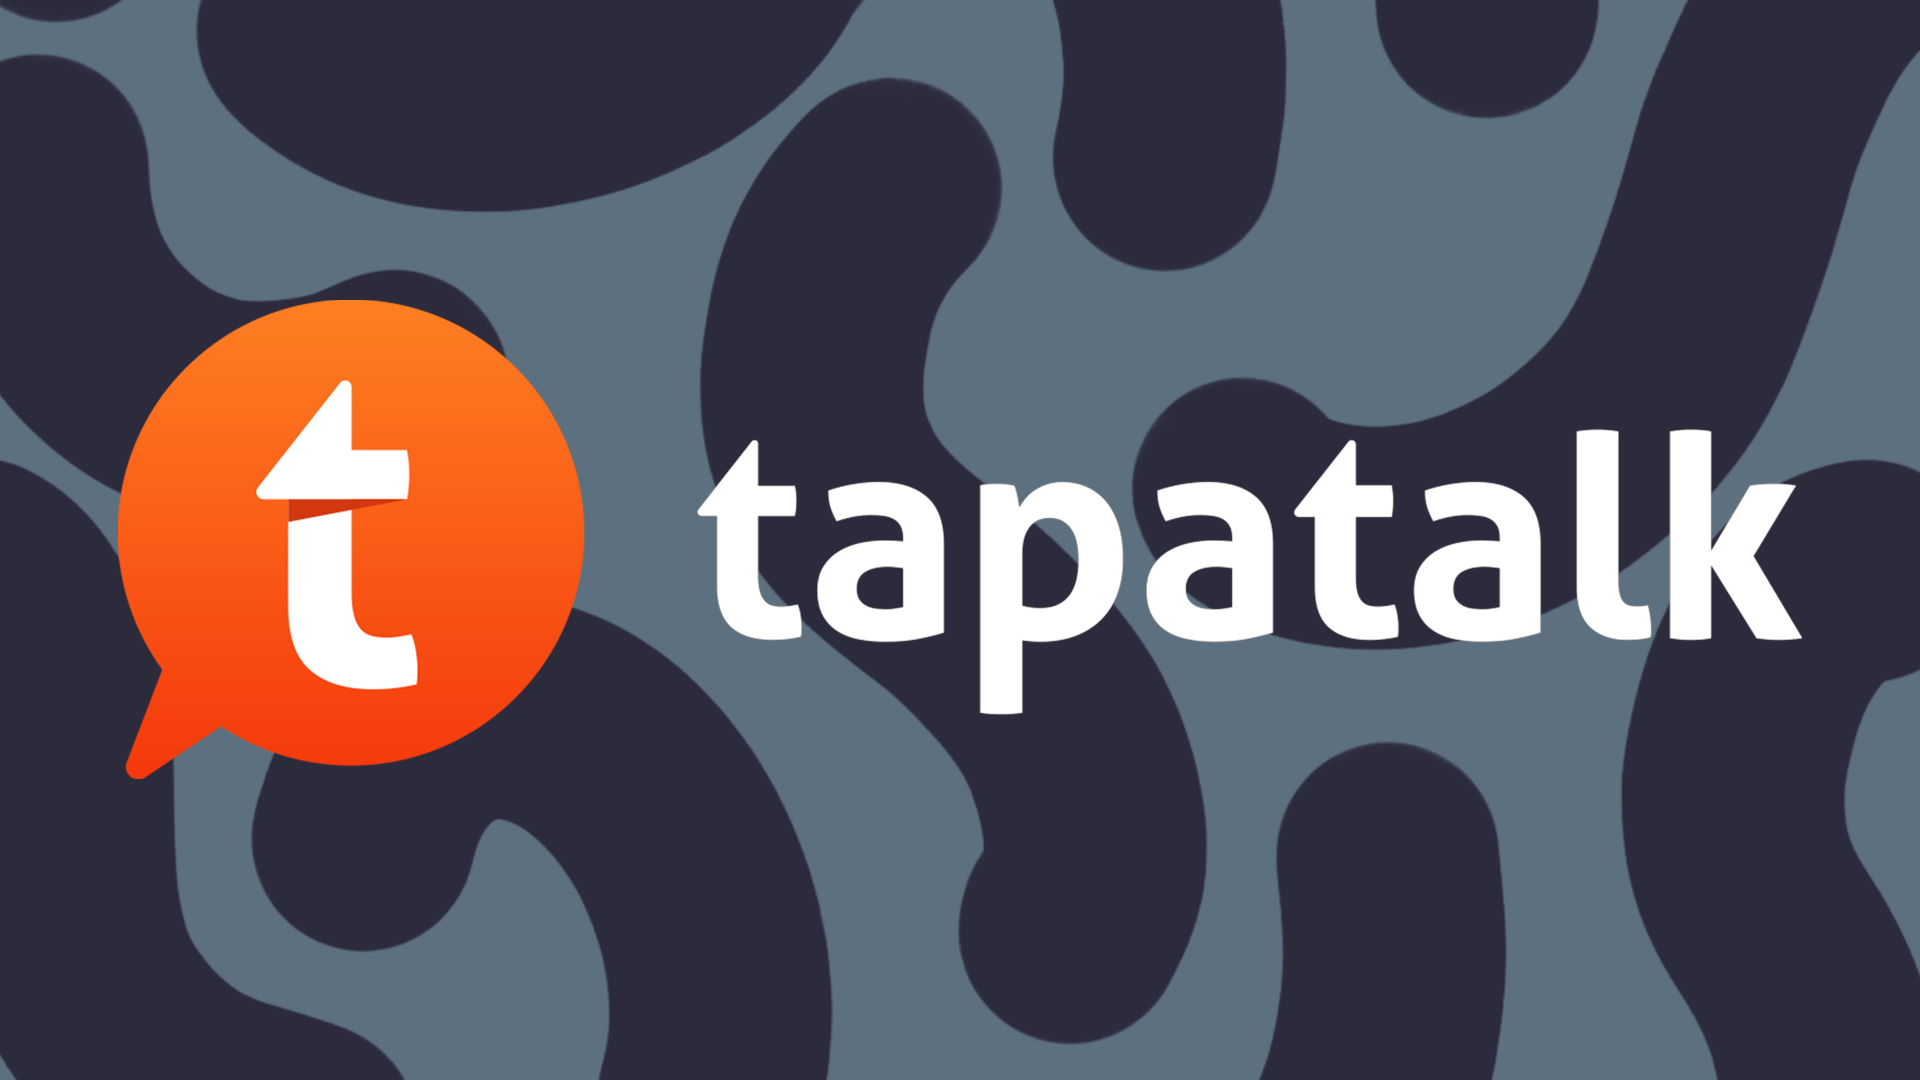 Tapatalk logo